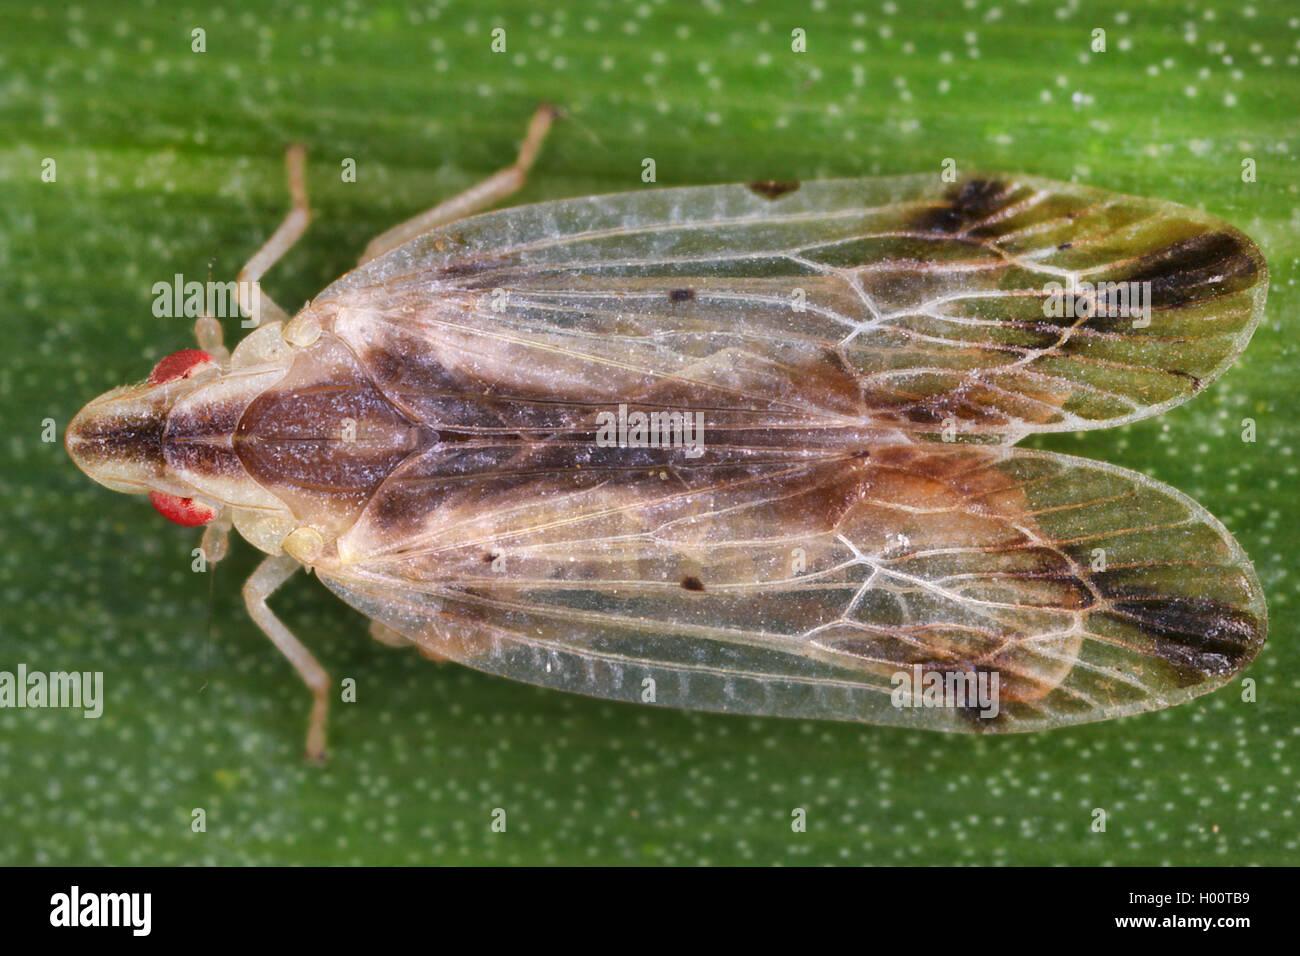 Mueckenzikade, Muecken-Zikade (Tropiduchidae), sitzt auf einem Blatt, Costa Rica | Tropiduchid planthopper (Tropiduchidae), - Stock Image